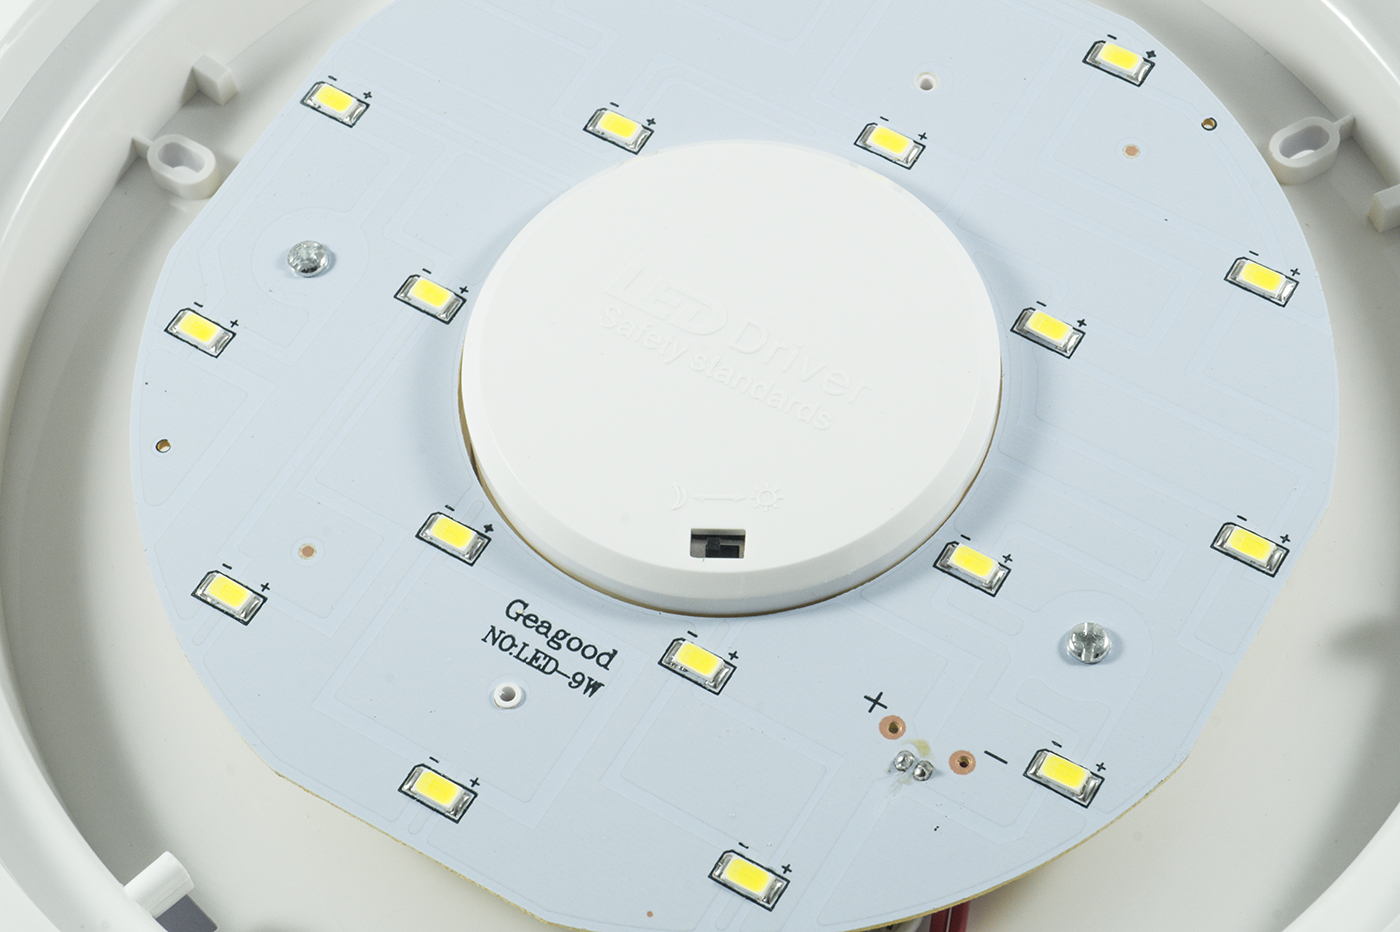 Plafoniera Quadrata Led : Bes plafoniere beselettronica plafoniera lampada led